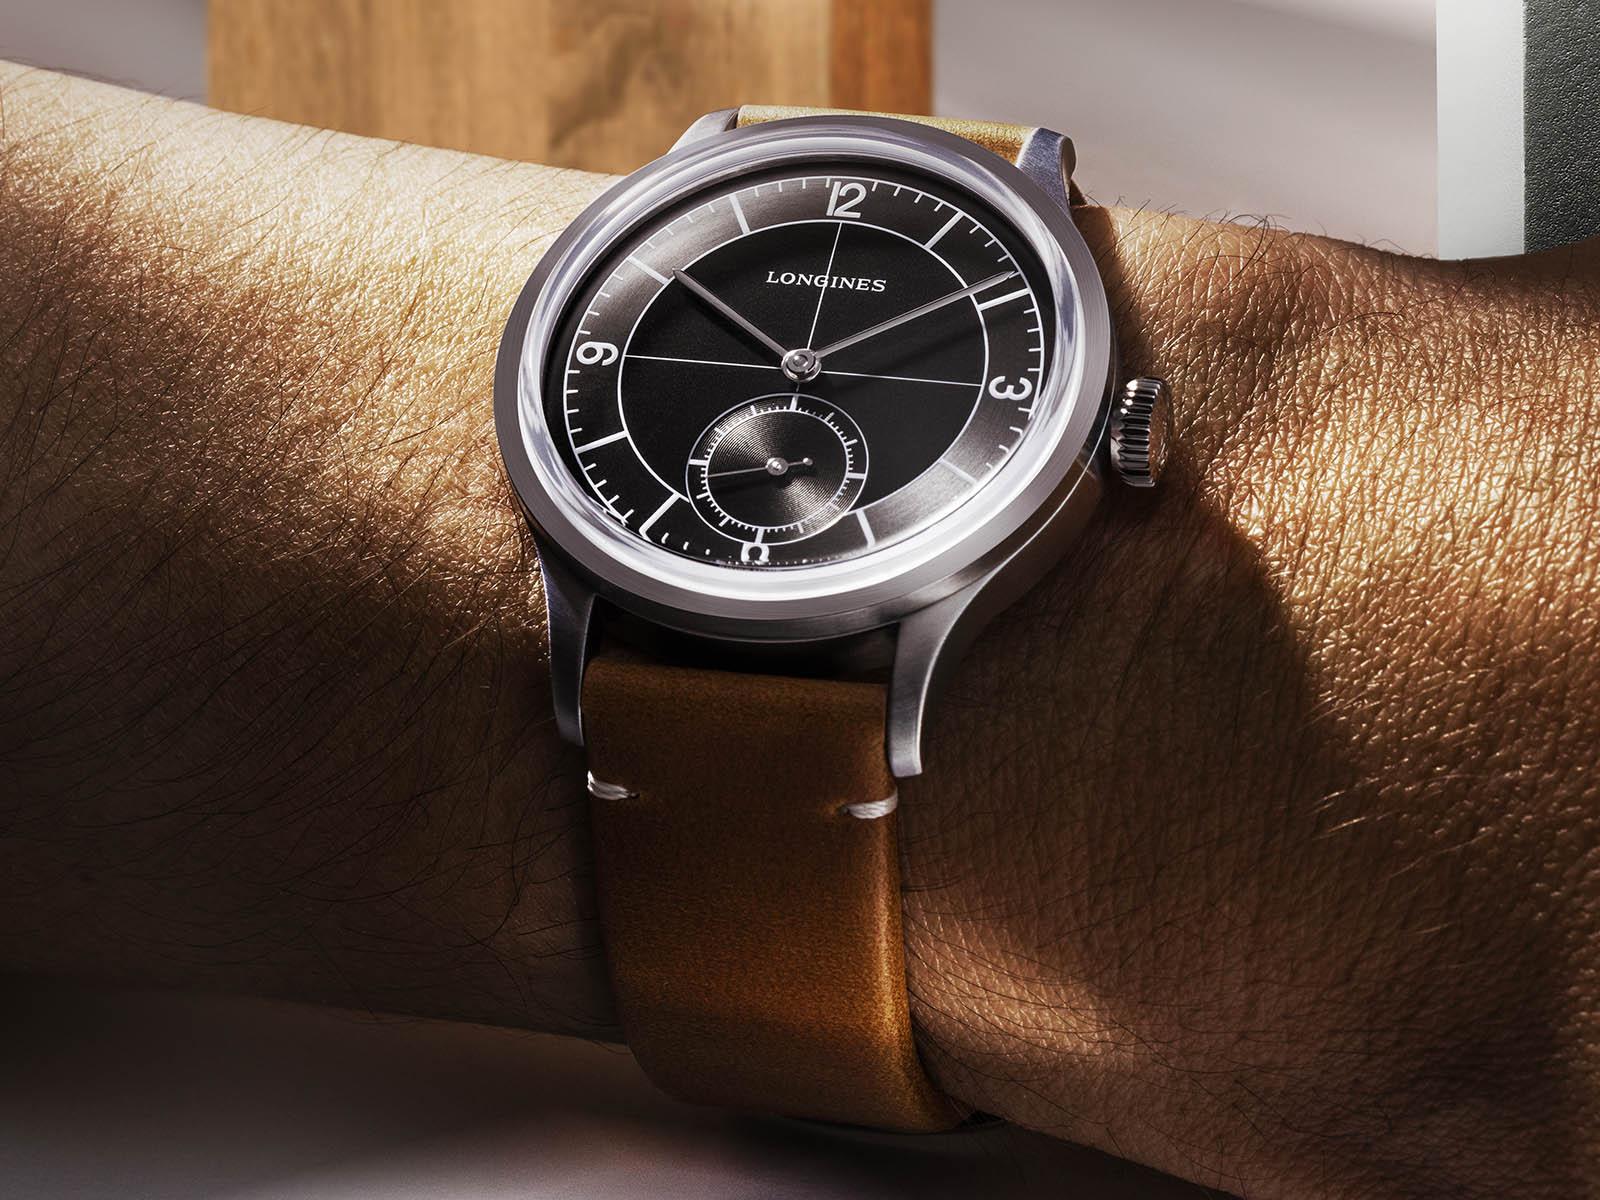 l2-828-4-53-2-longines-heritage-classic-black-dial-2.jpg